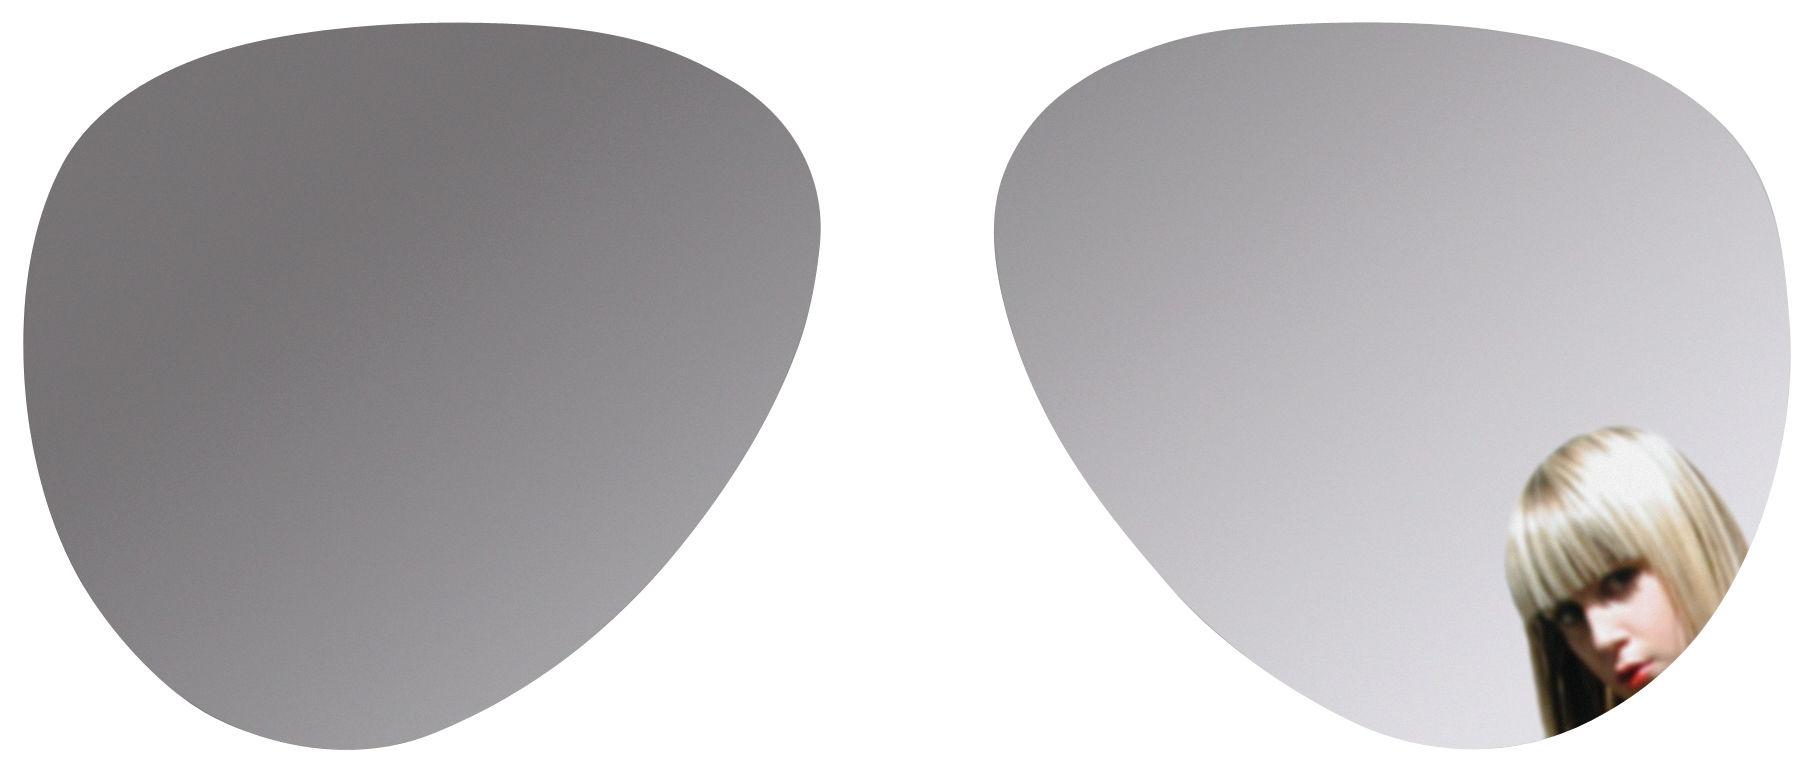 Möbel - Spiegel - Aviator Selbstklebende Spiegel / selbstklebend - Domestic - Spiegel - Perspex